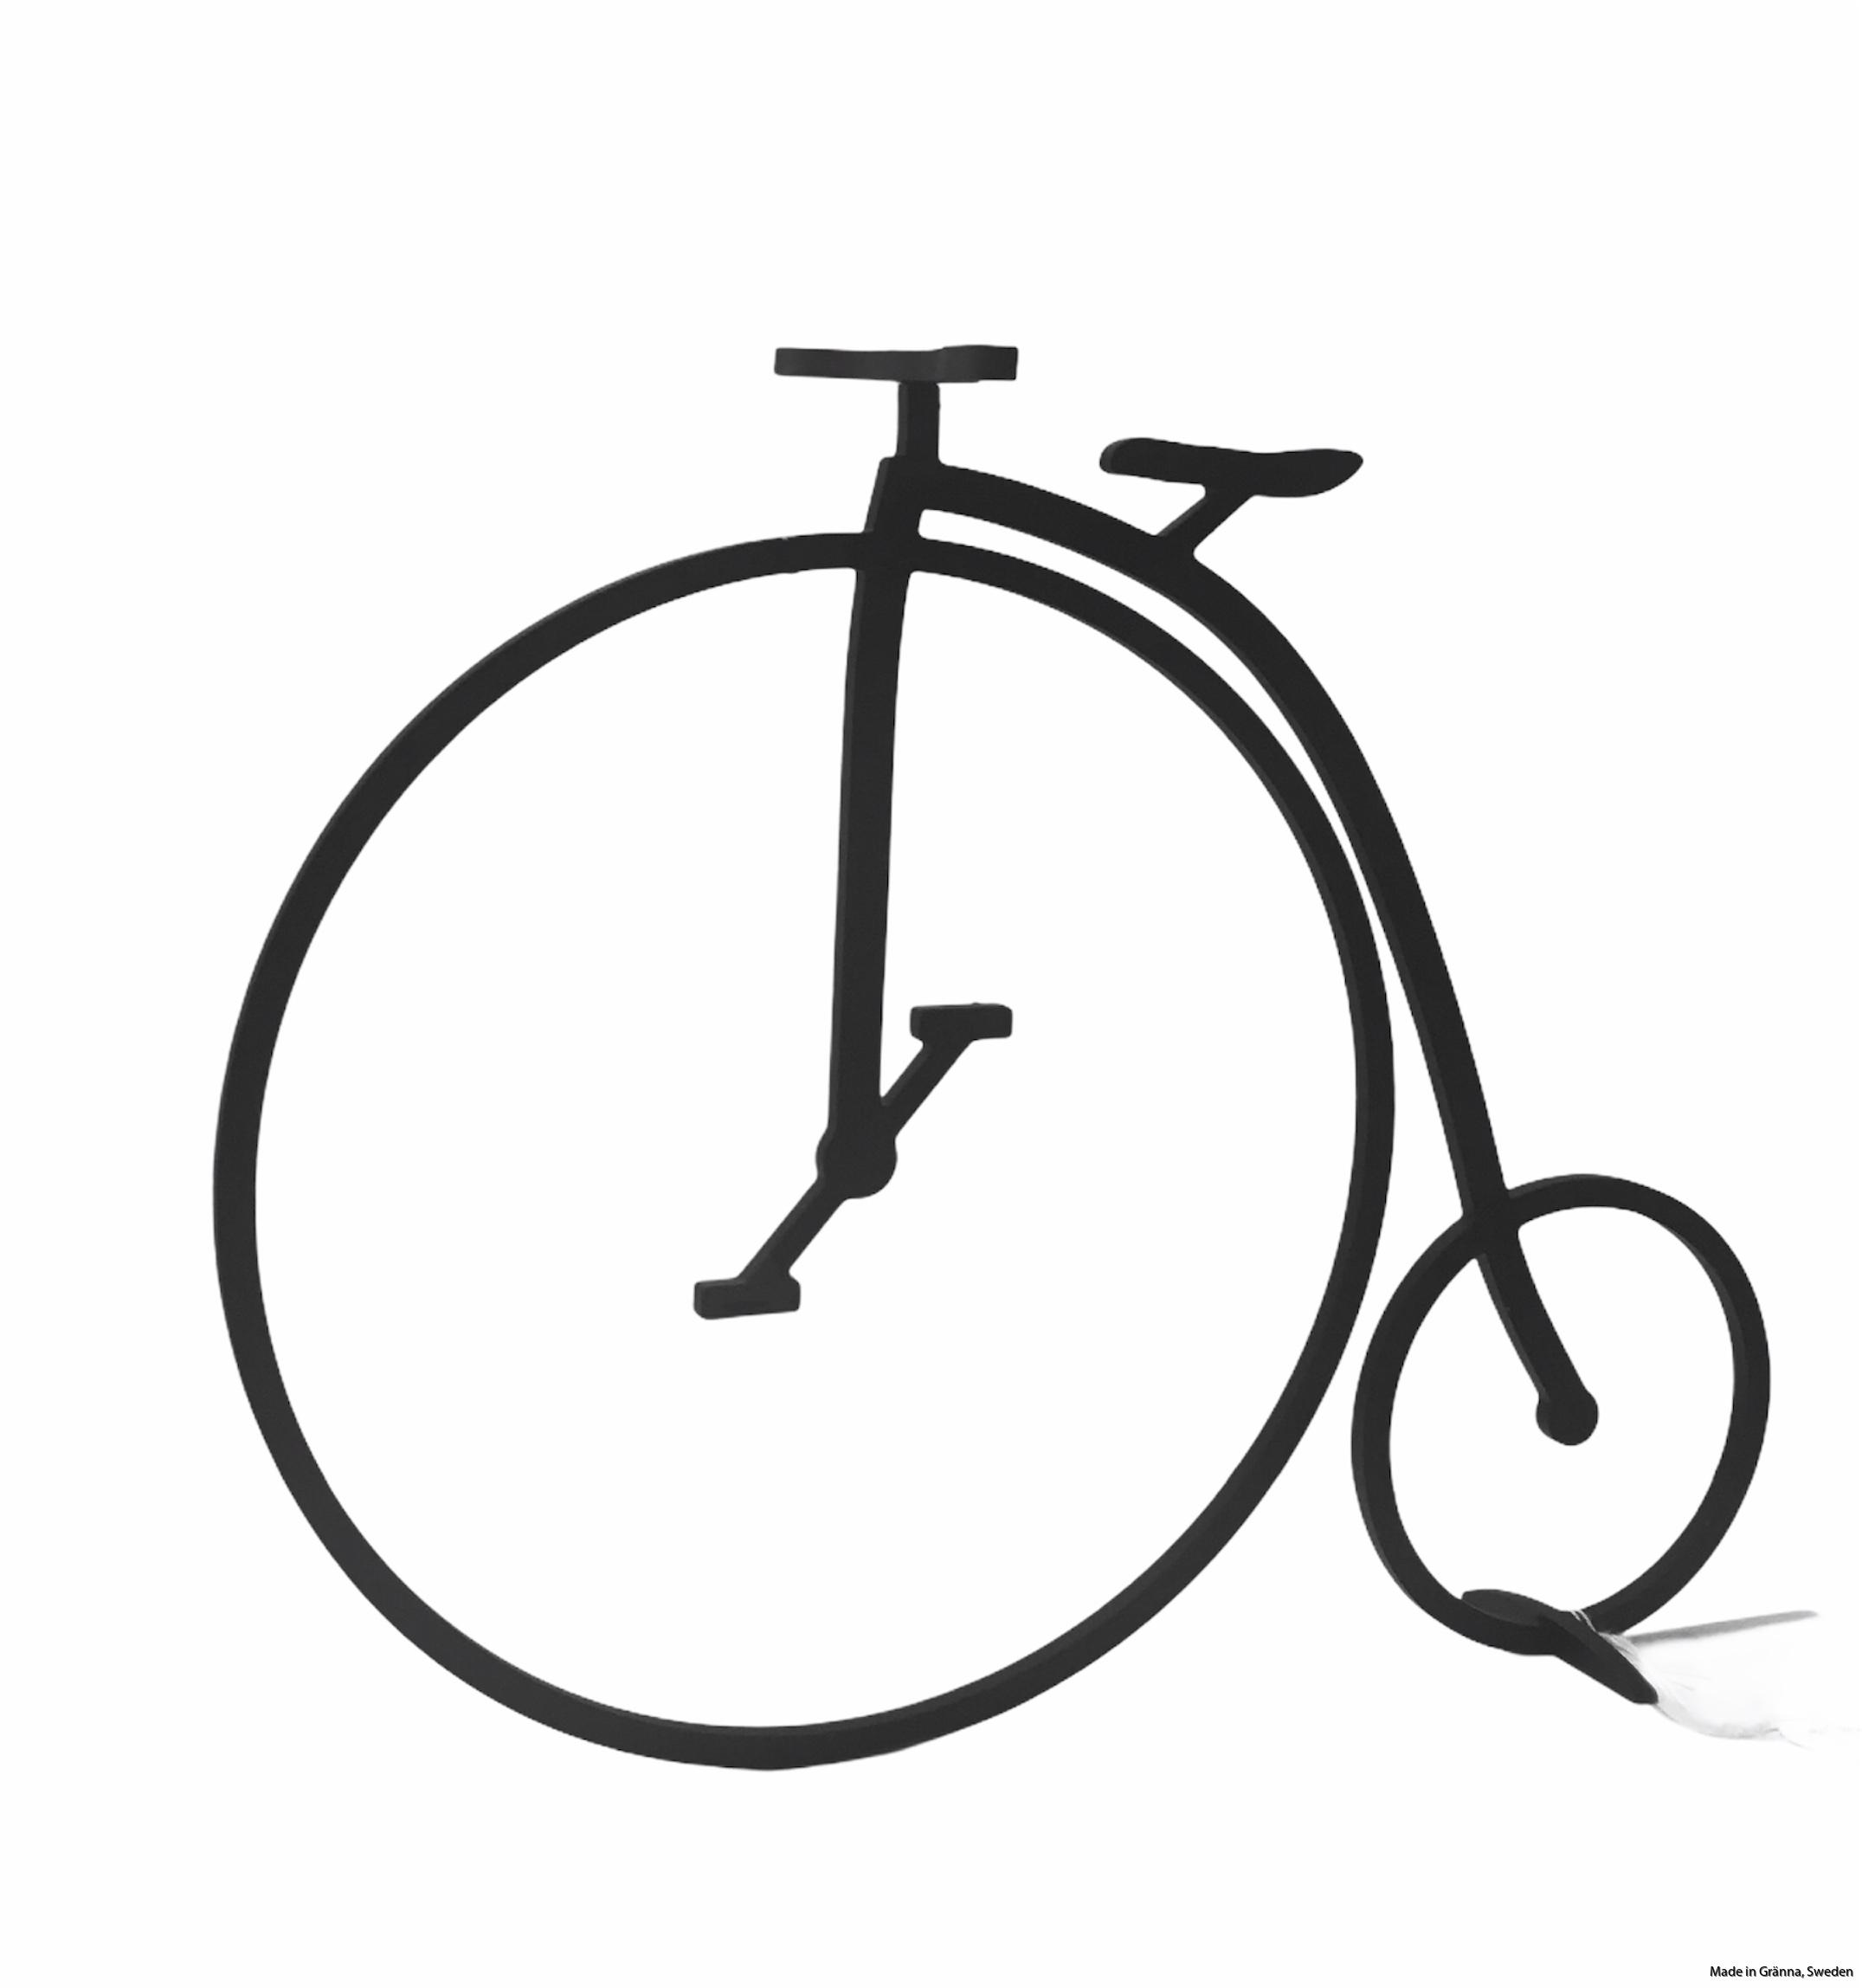 Höghjuling